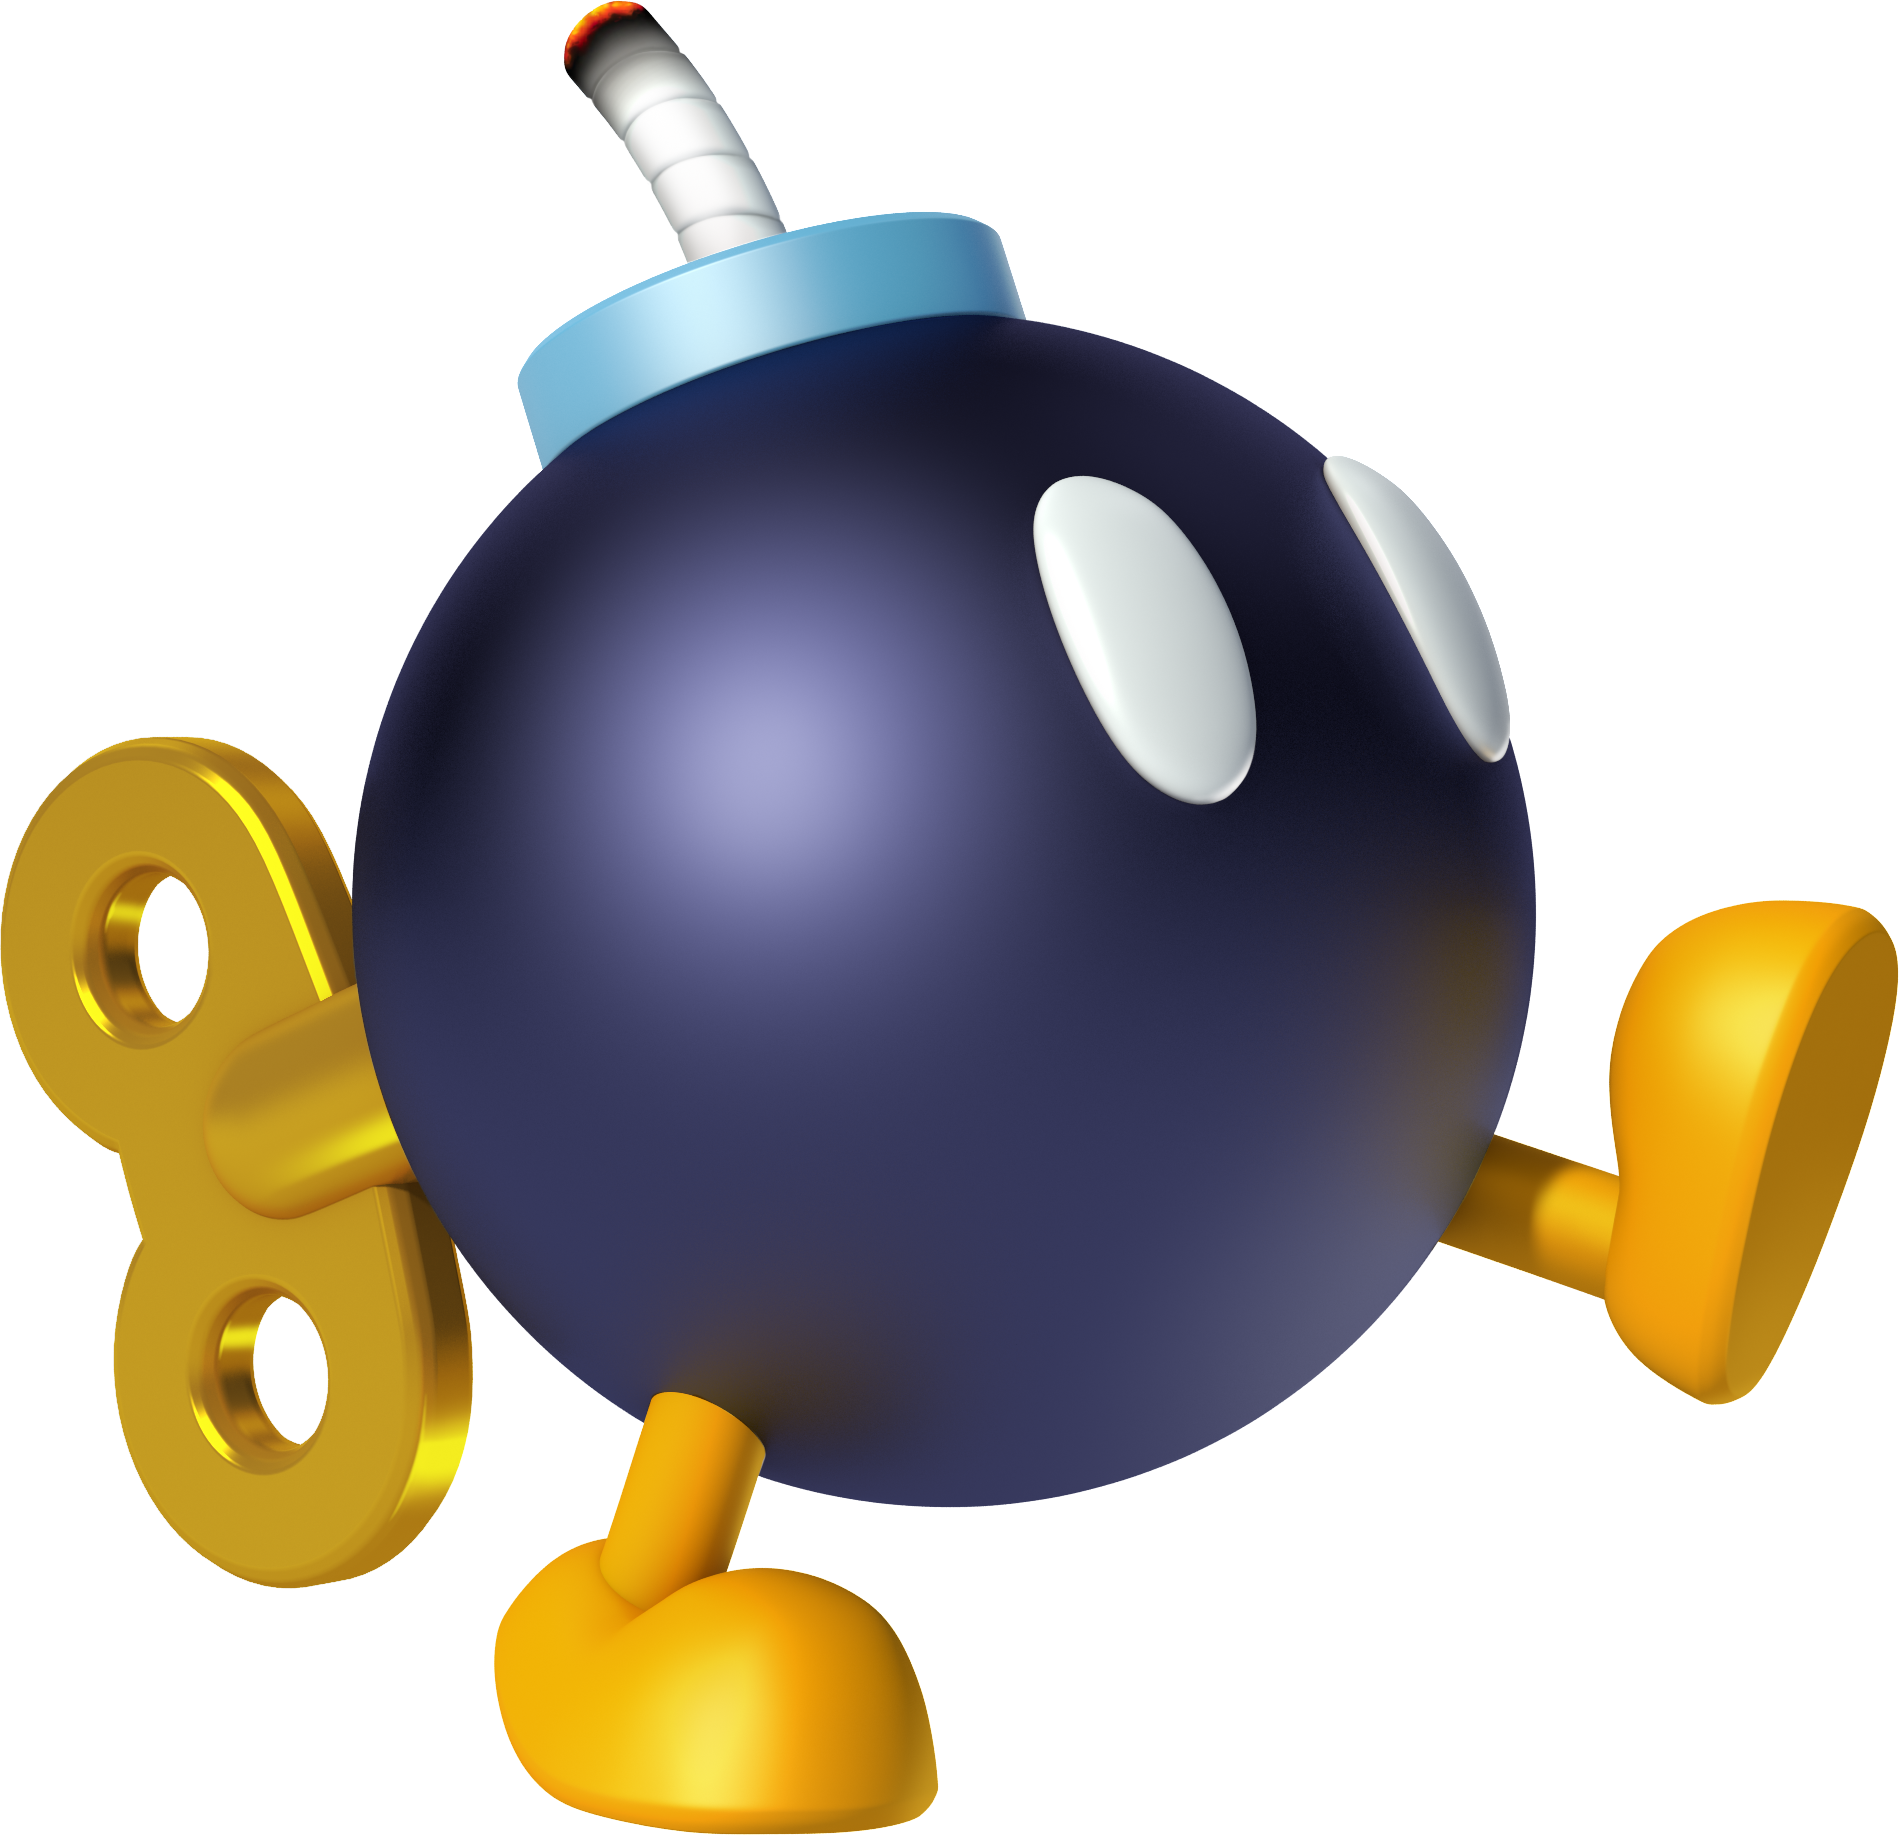 Bob Omb Mario Kart 8 Png Mario Kart Mario Kart 8 Mario